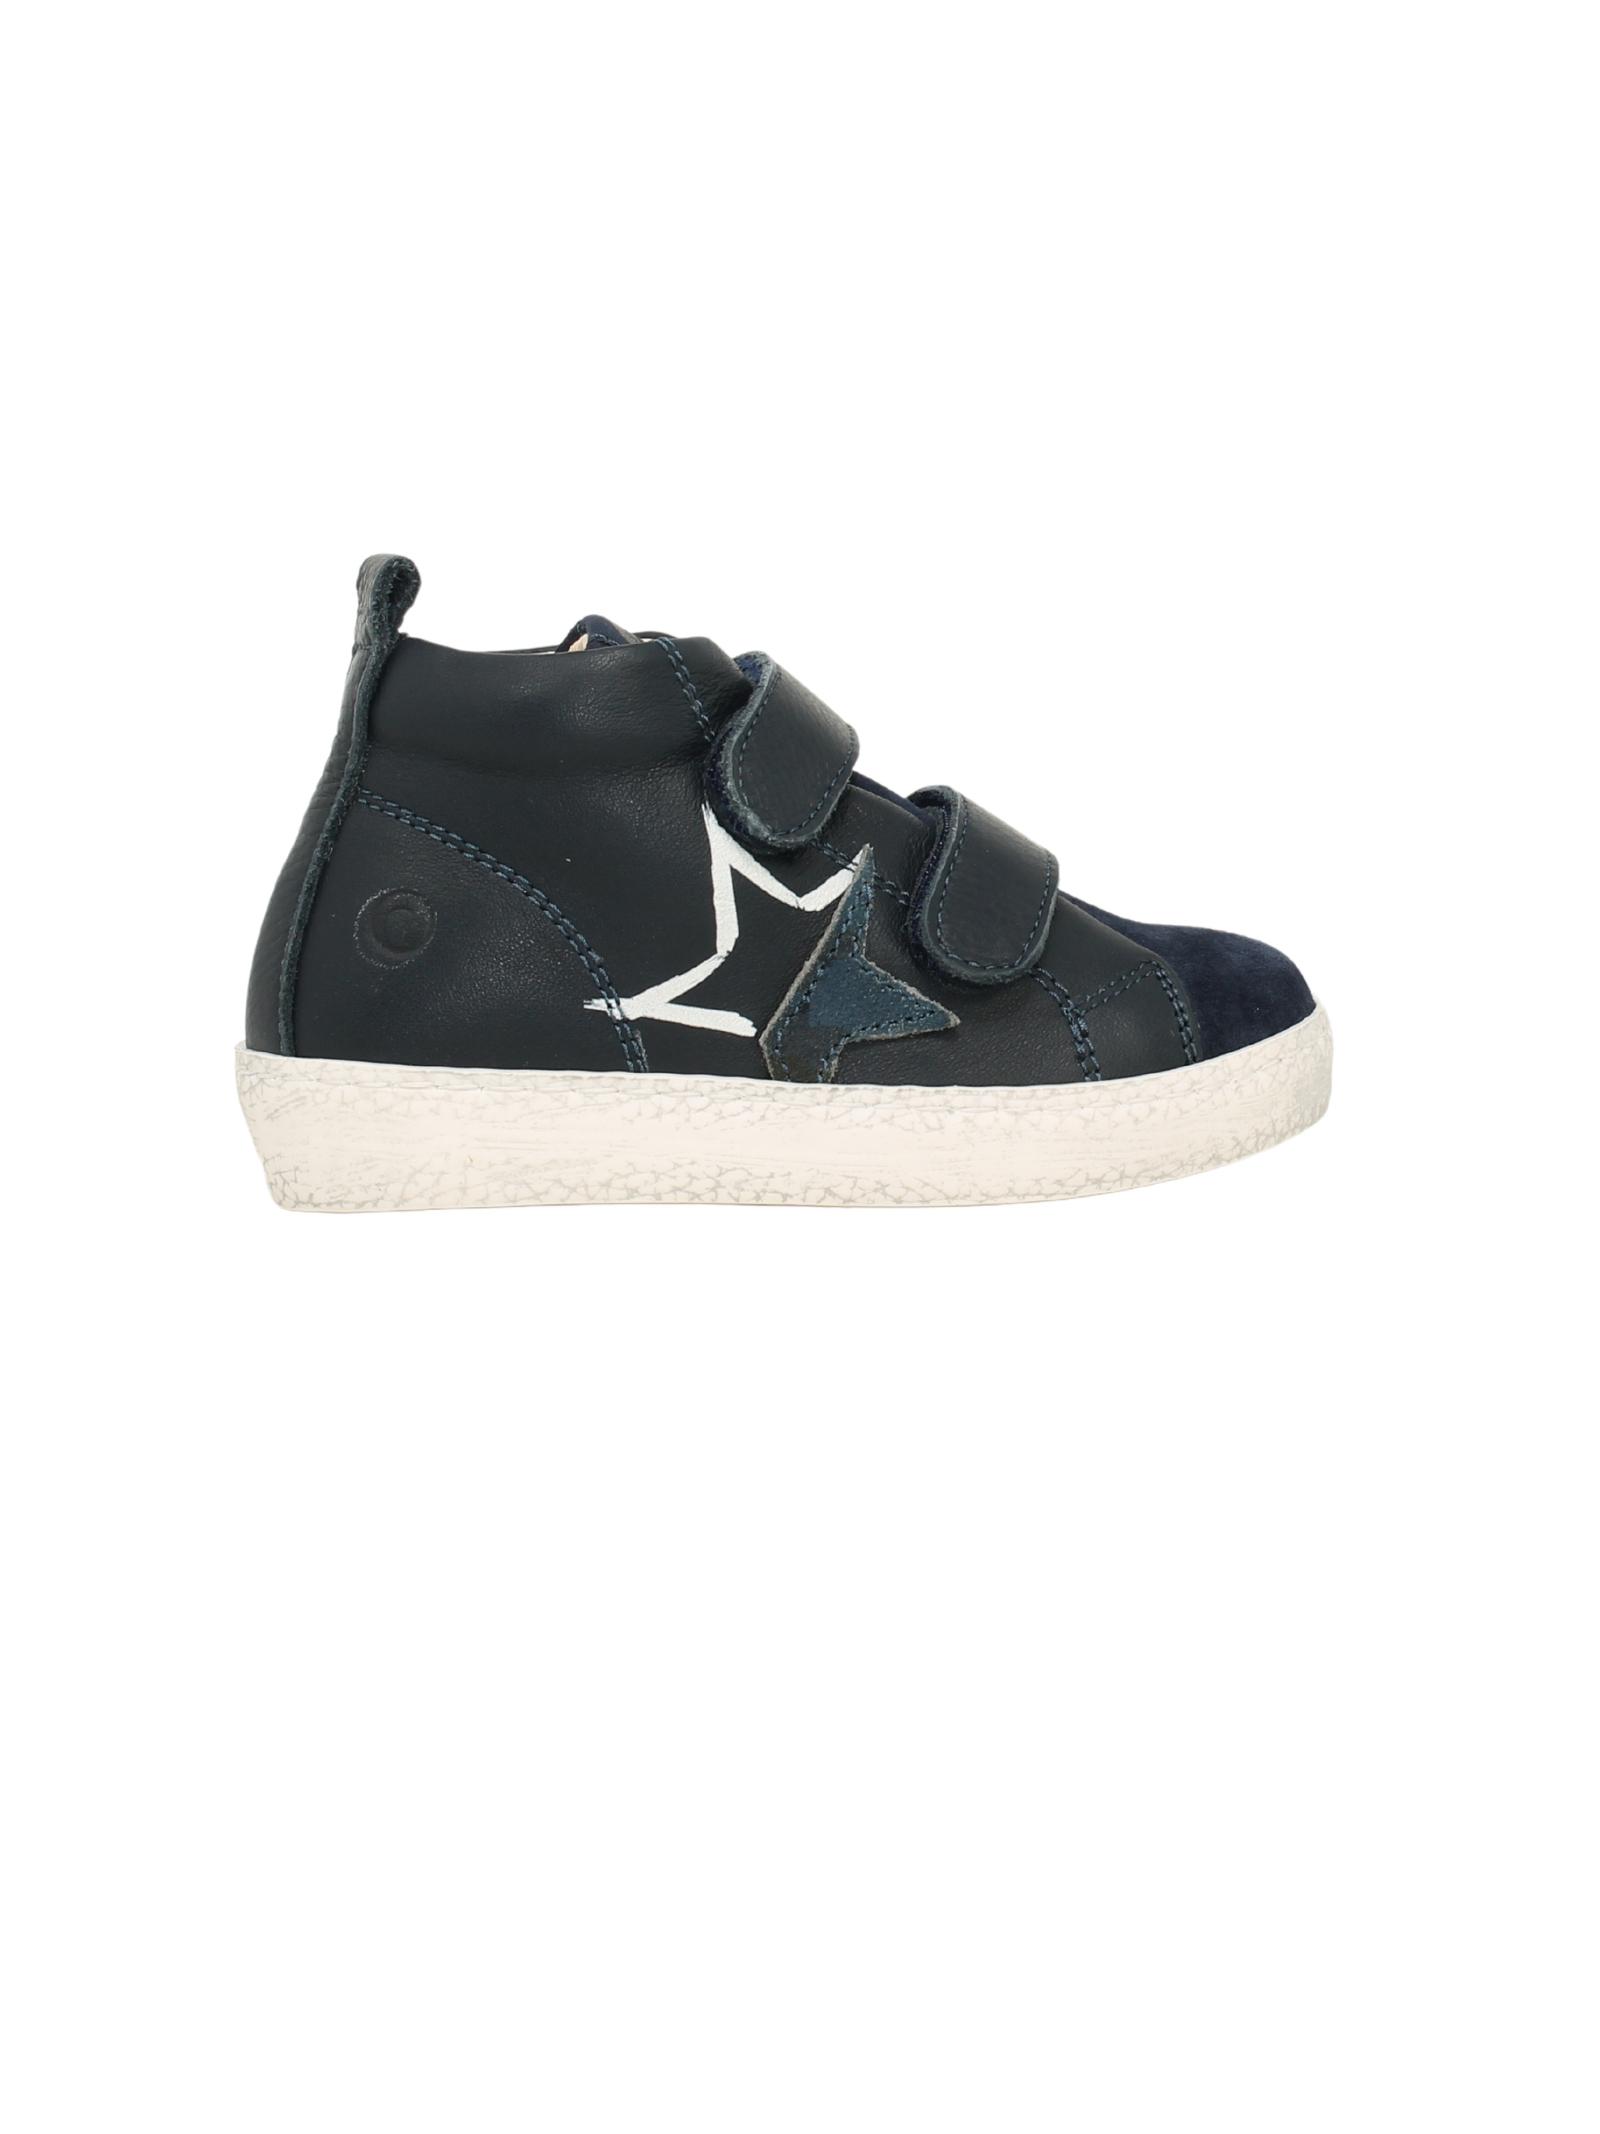 Sneakers Alta Stella Child WALKEY | Sneakers | Y1B4413490221800BLU